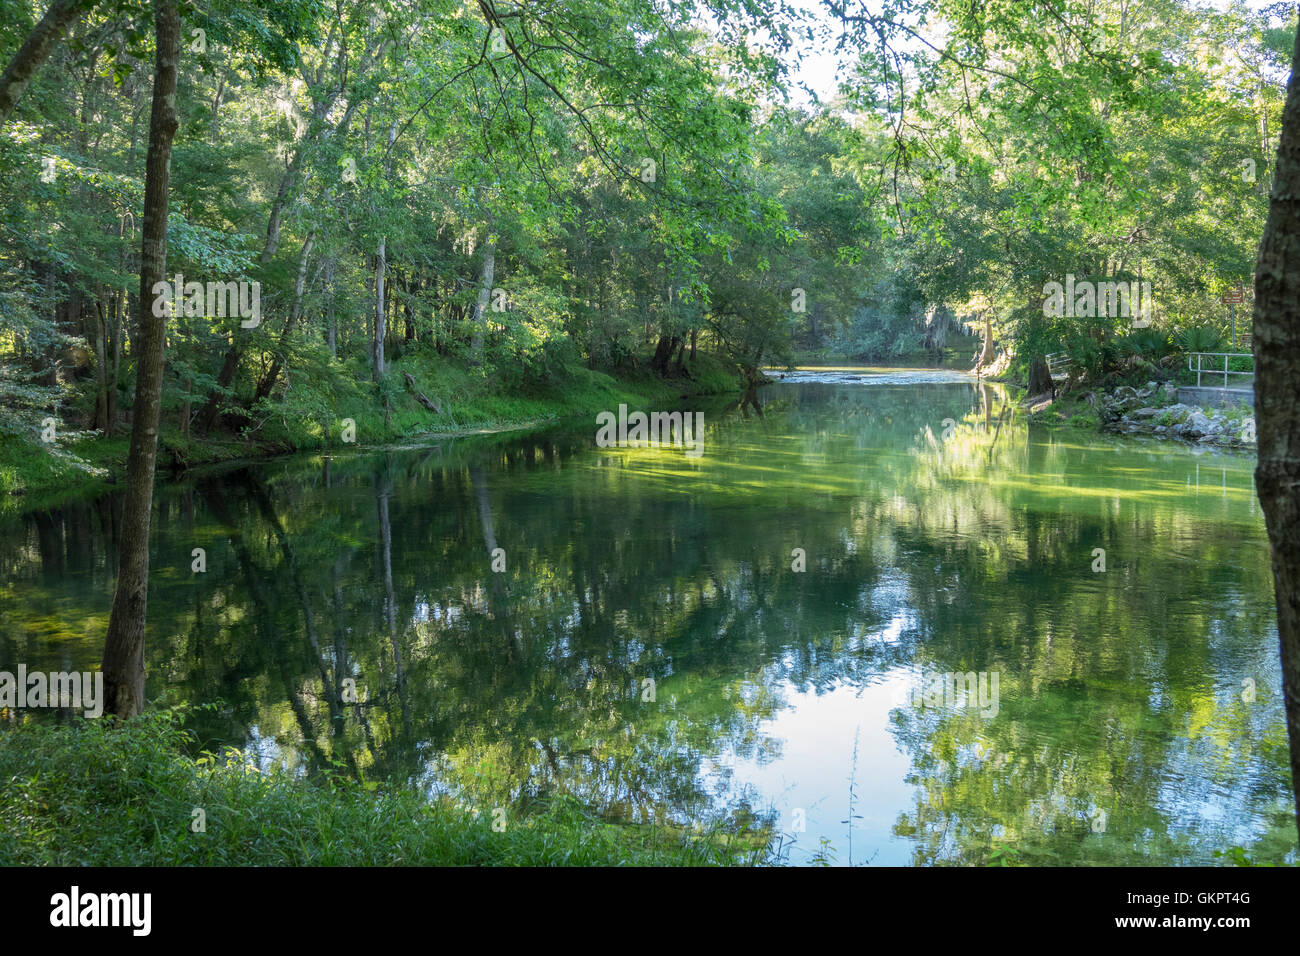 Poe Springs run at Santa Fe river, Gilchrist County, Florida - Stock Image